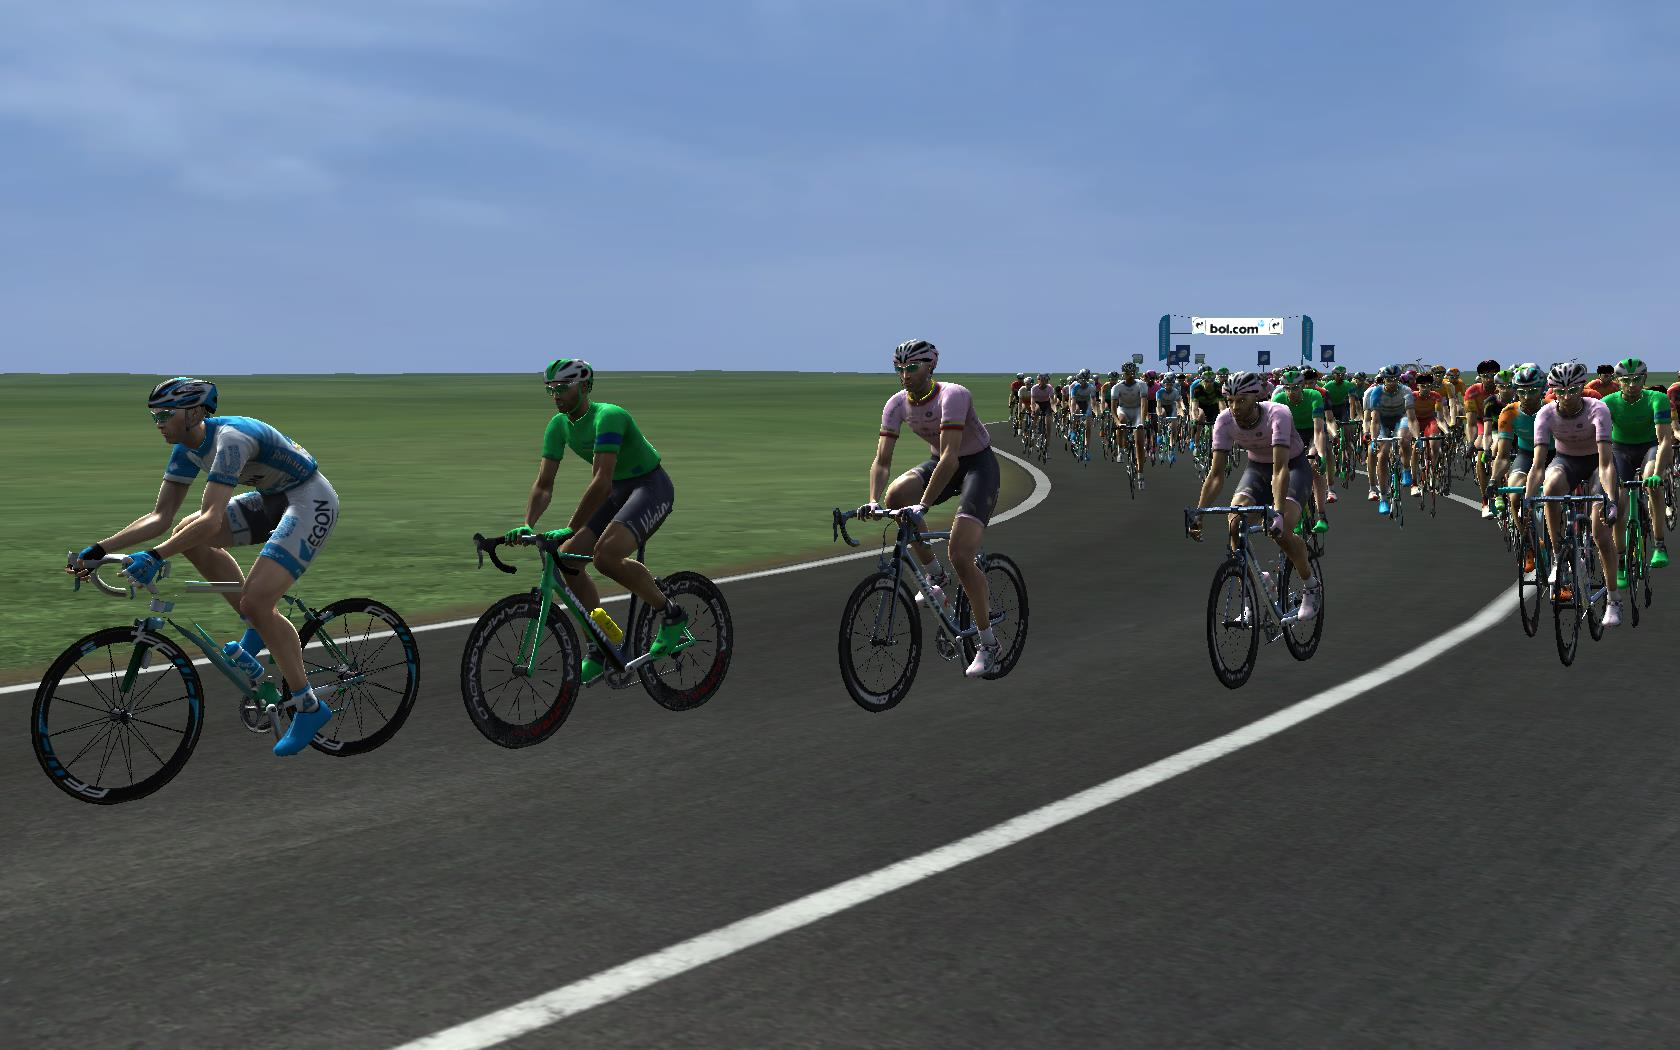 pcmdaily.com/images/mg/2018/Races/C2/USAPCC/1/PCM0005.jpg